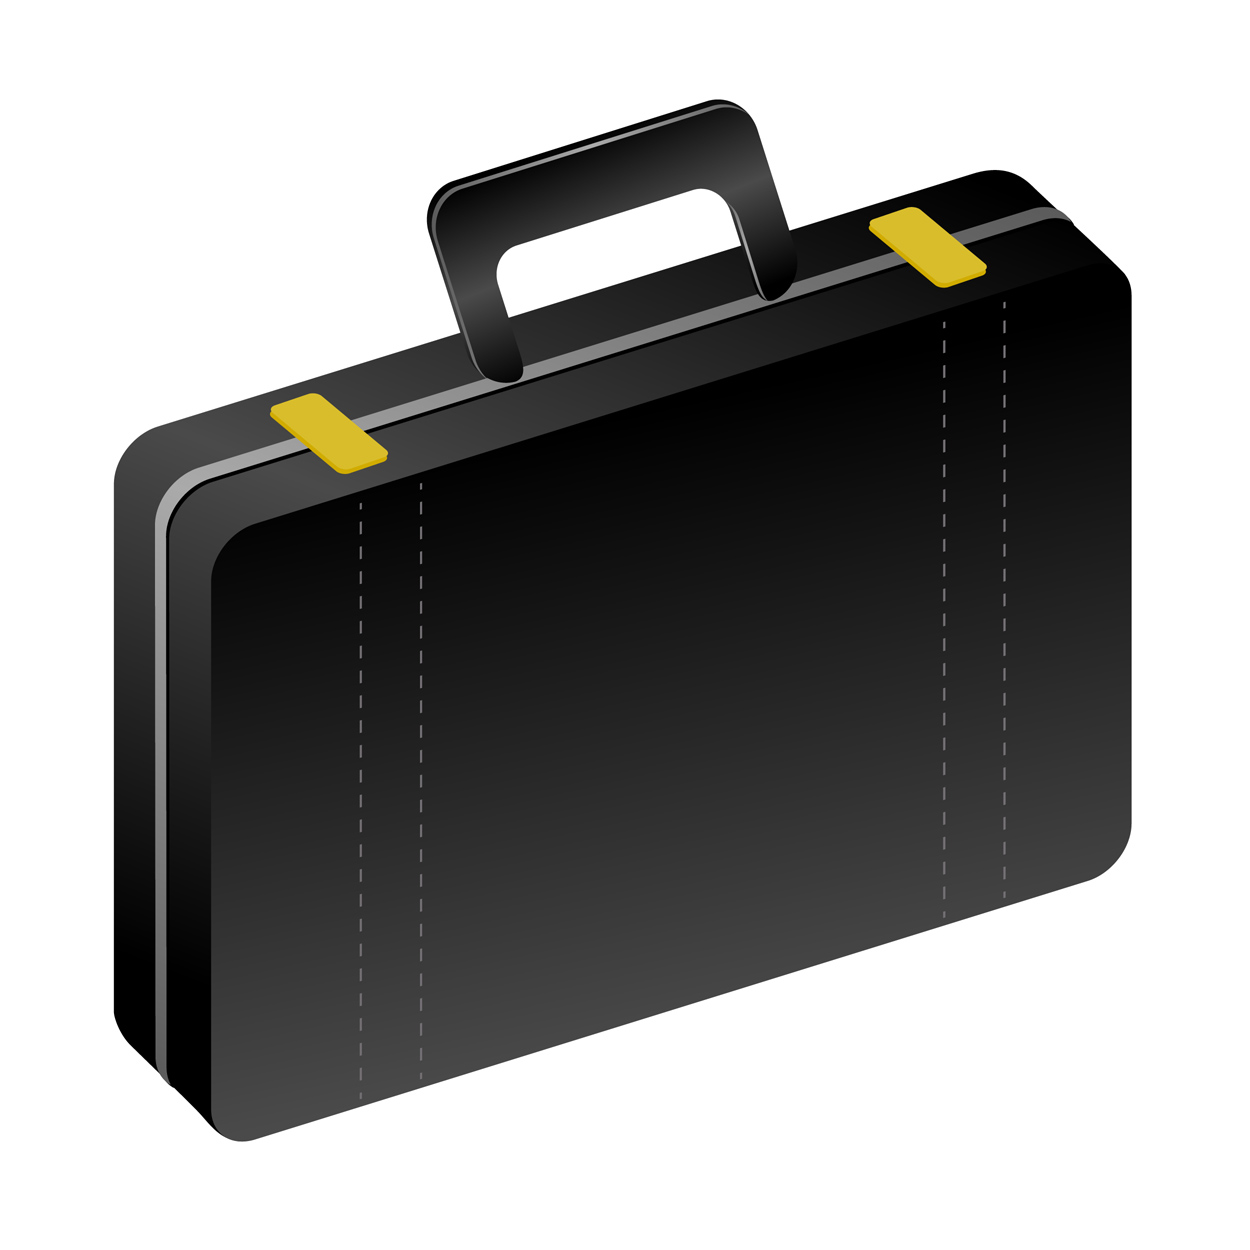 1250x1250 Business Clipart Suitcase